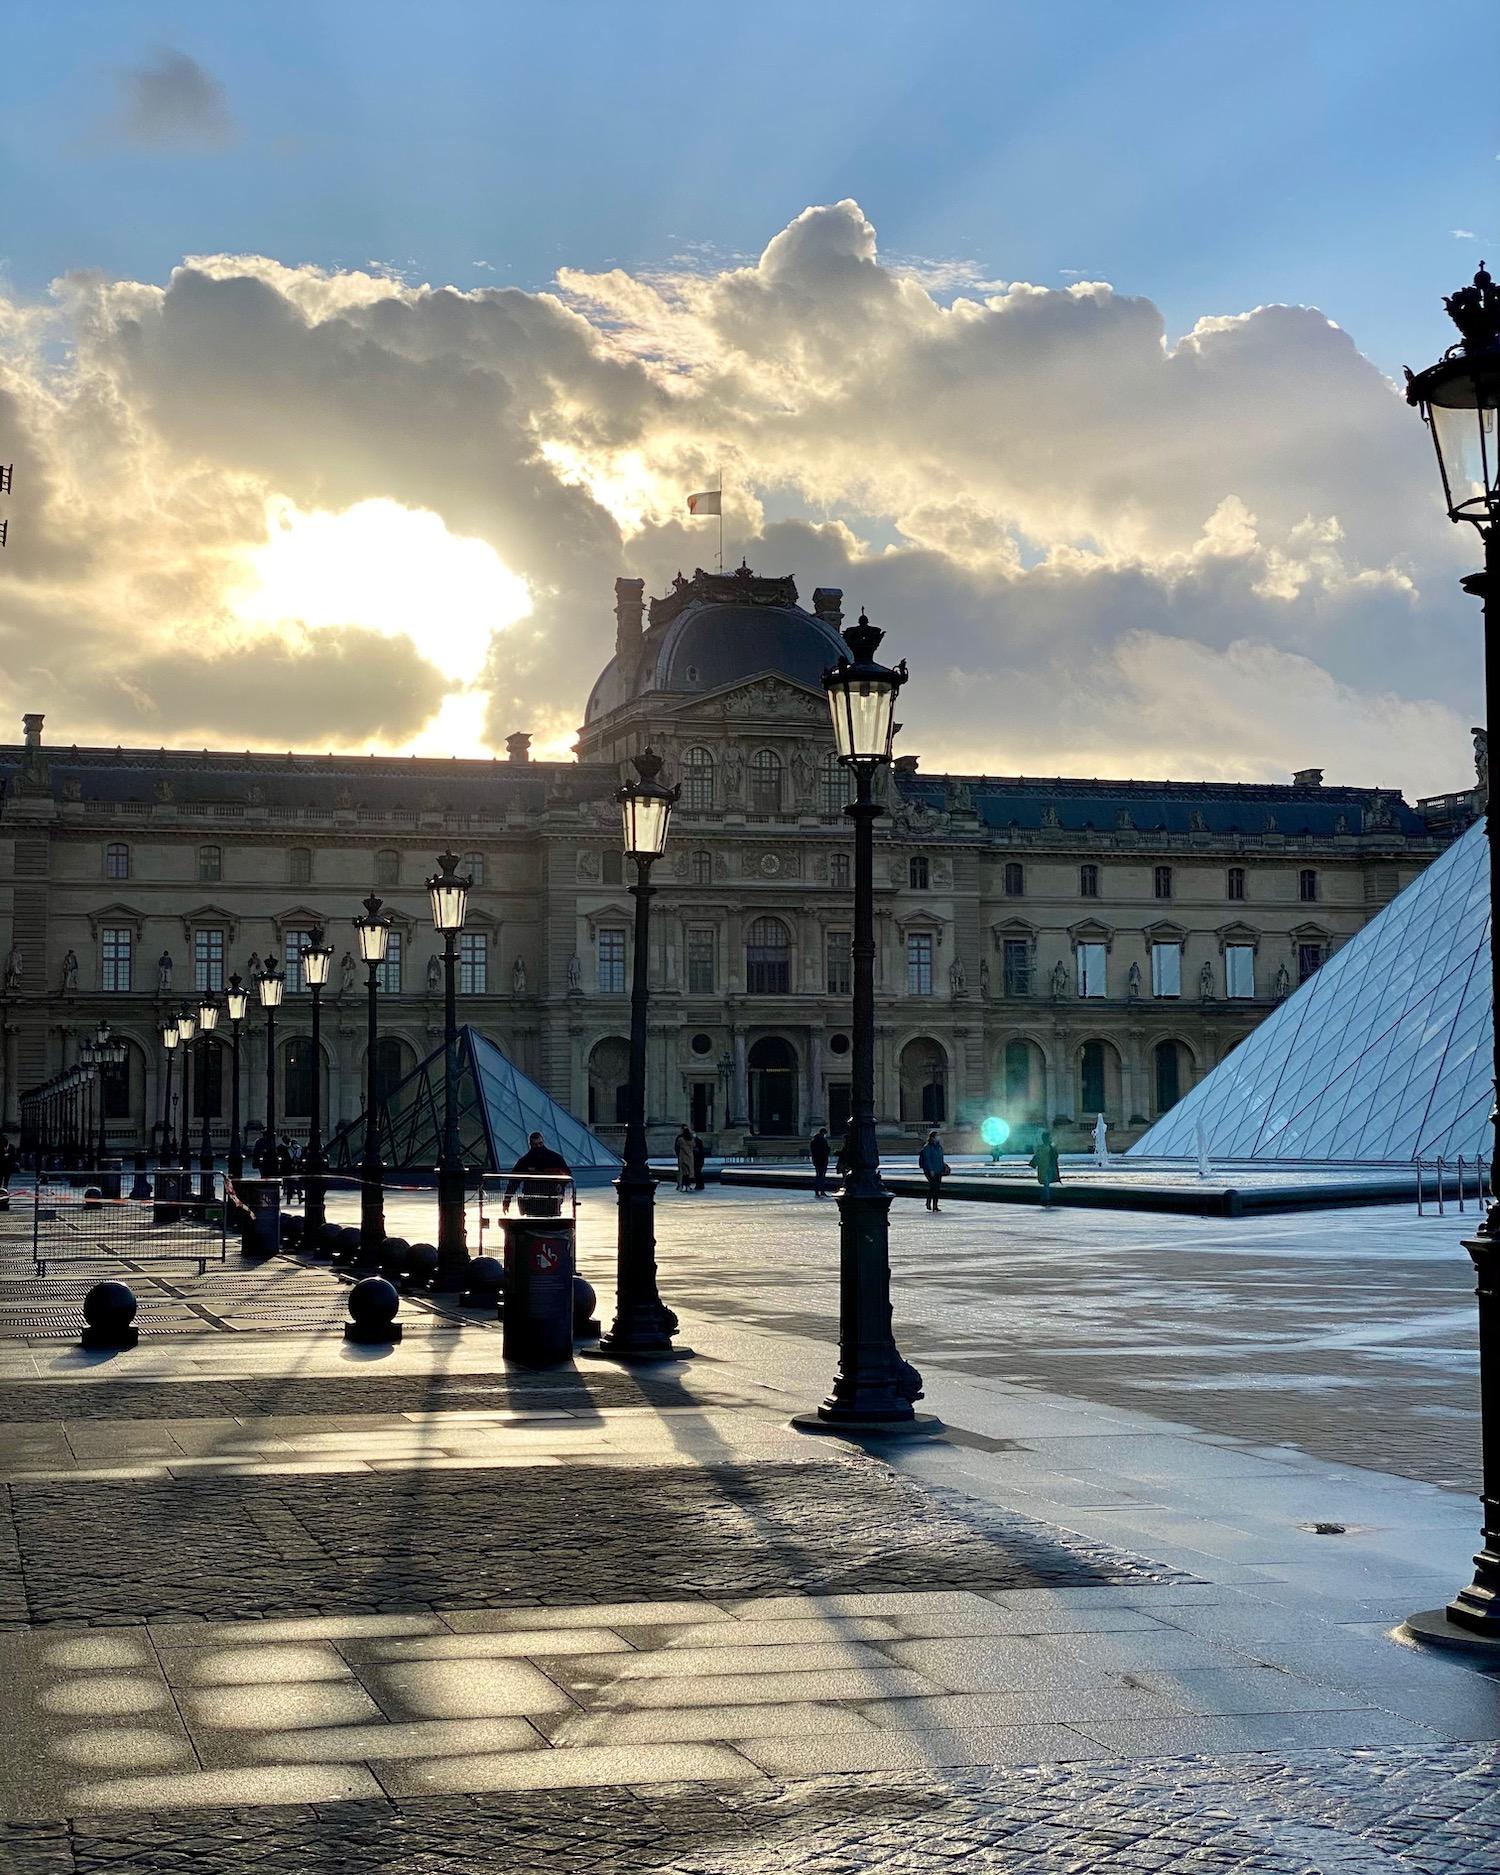 musée du louvre morning view